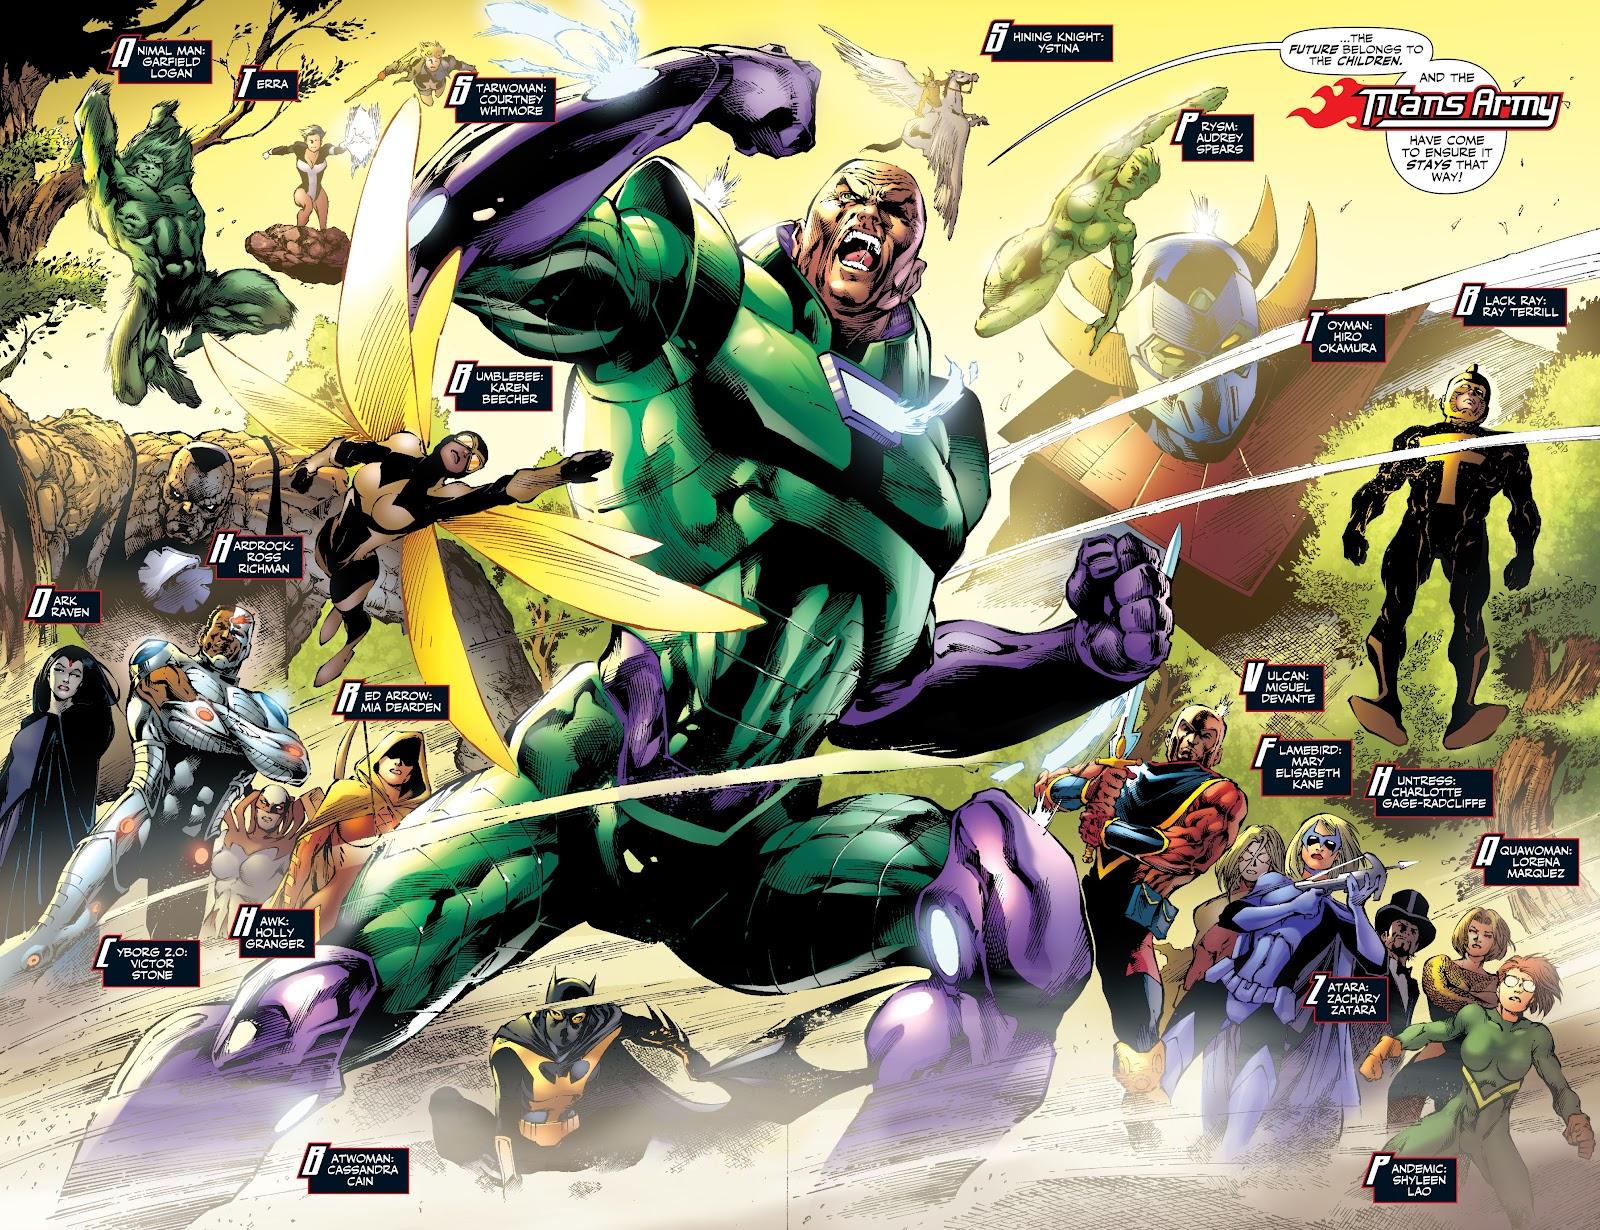 Titans Army